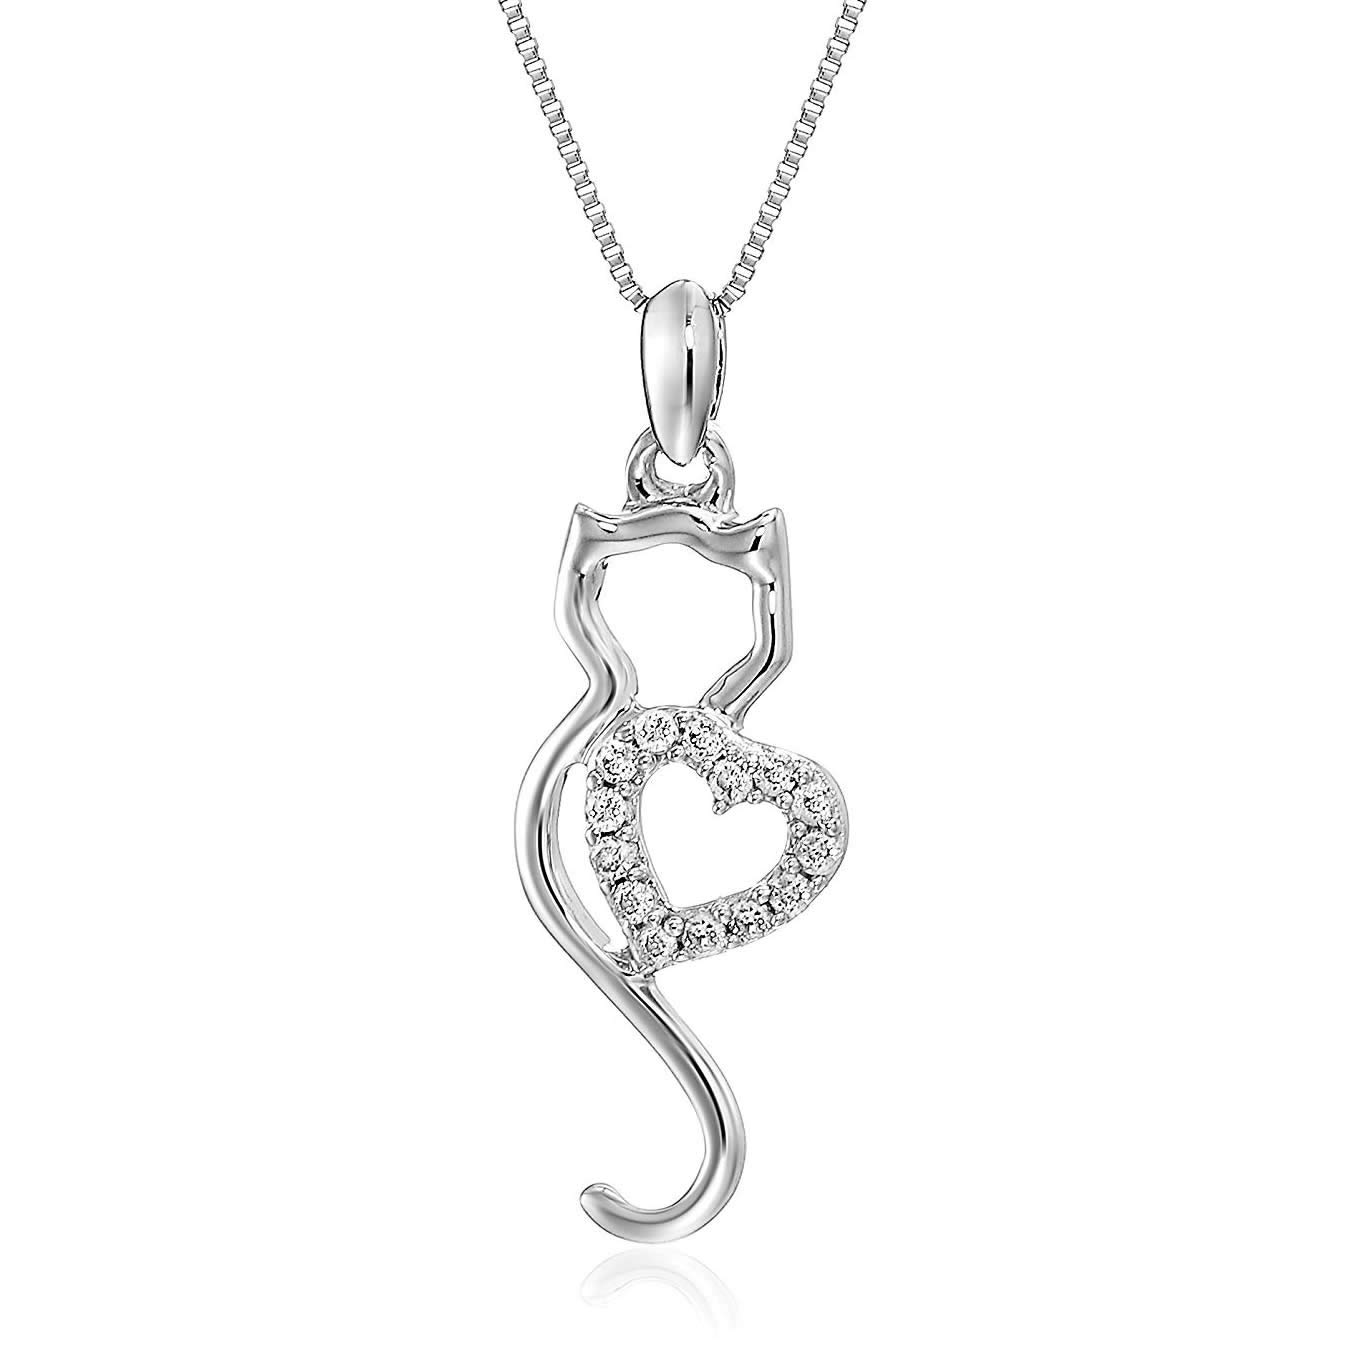 d436b96adb7 Amazon.com: Vir Jewels 1/10 cttw Diamond Cat Pendant In 14K White Gold with  18 Inch Chain: Jewelry